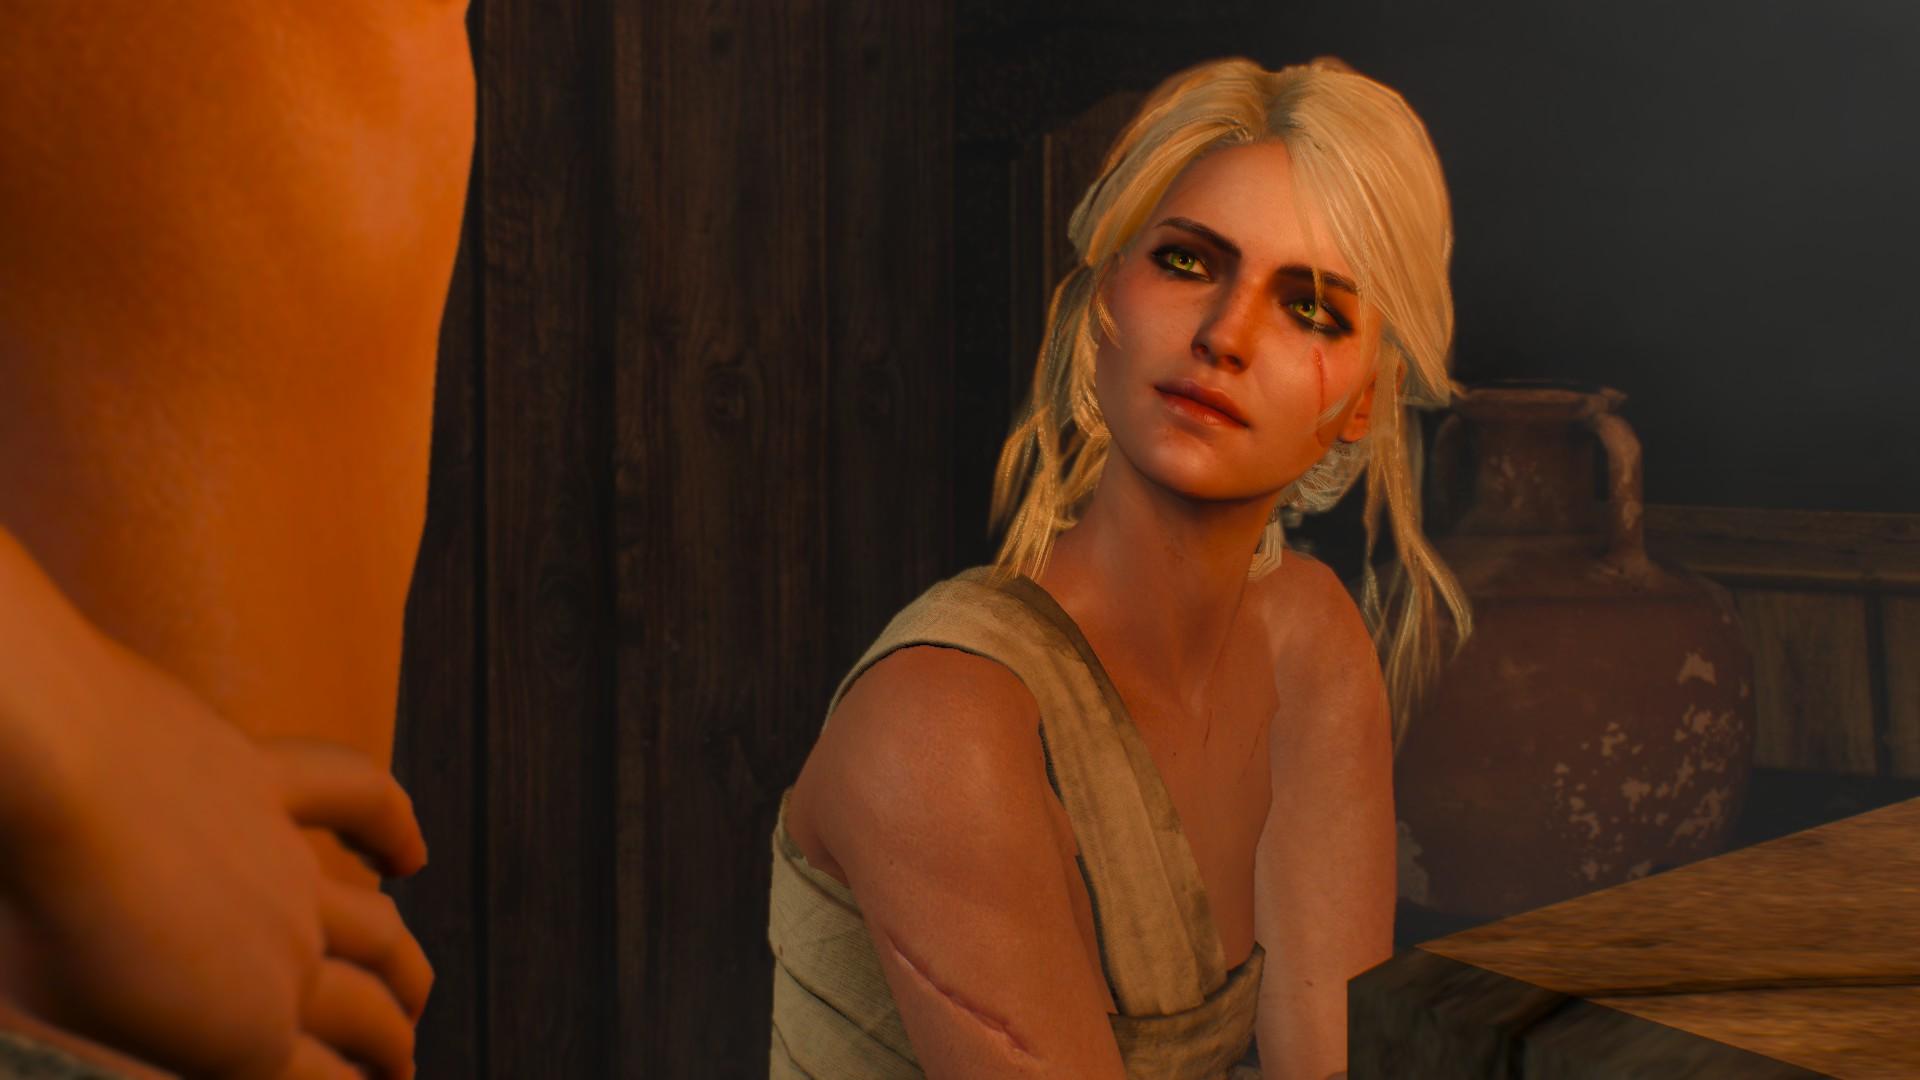 292030_screenshots_20181030211215_1.jpg - Witcher 3: Wild Hunt, the